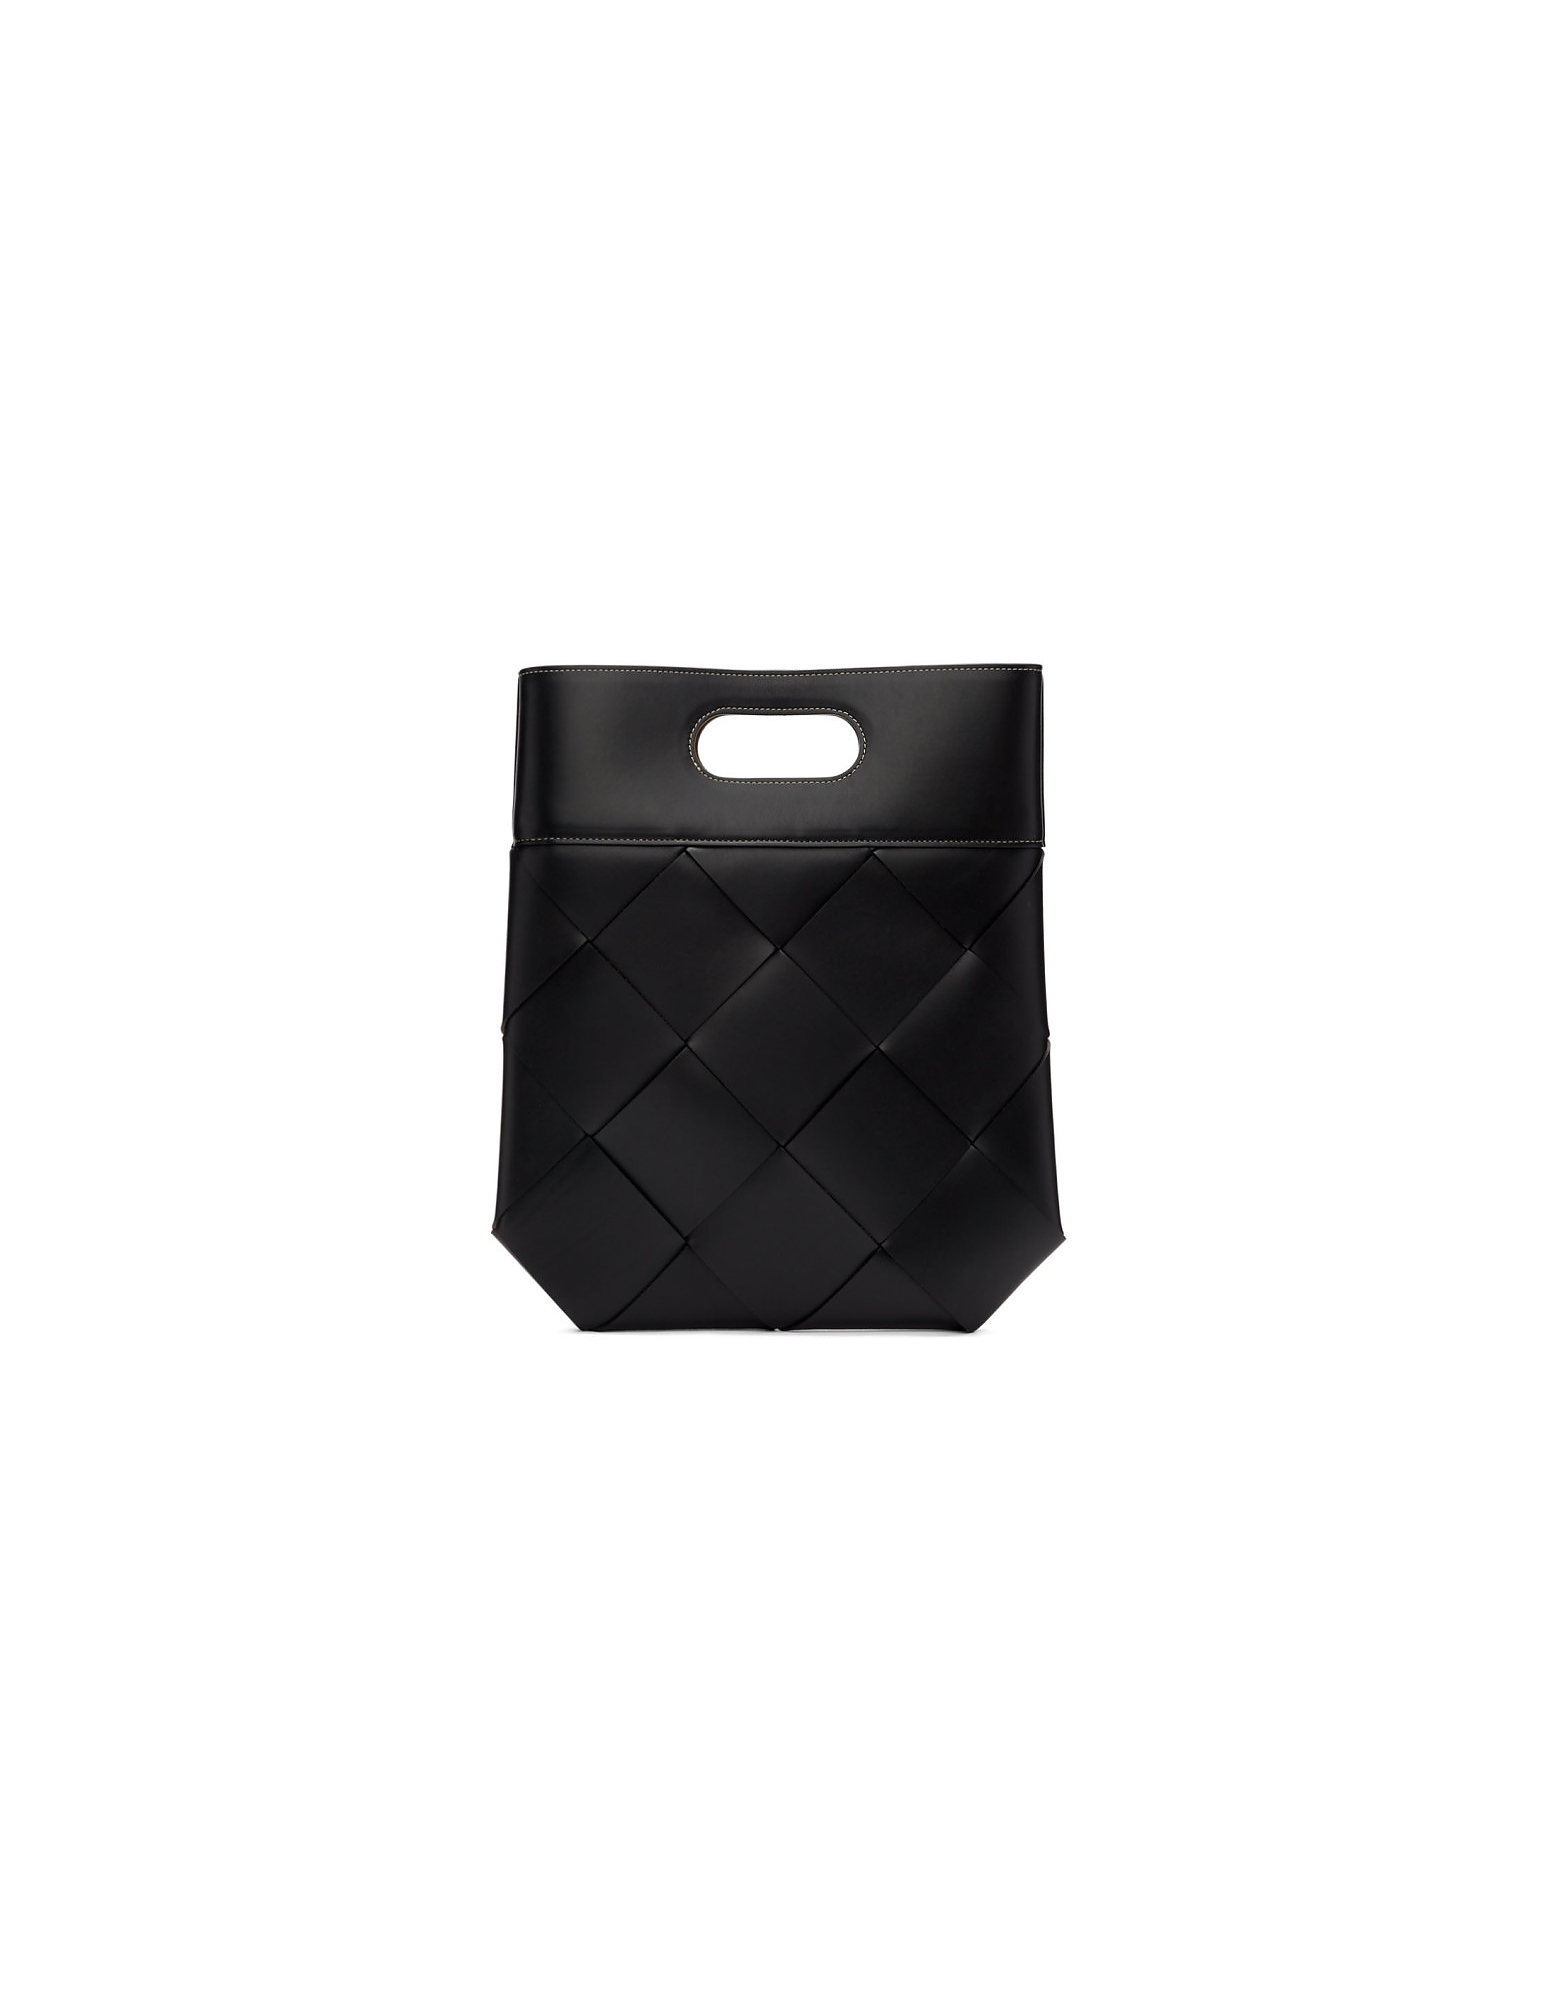 Bottega Veneta Designer Handbags, Black Small Slip Tote